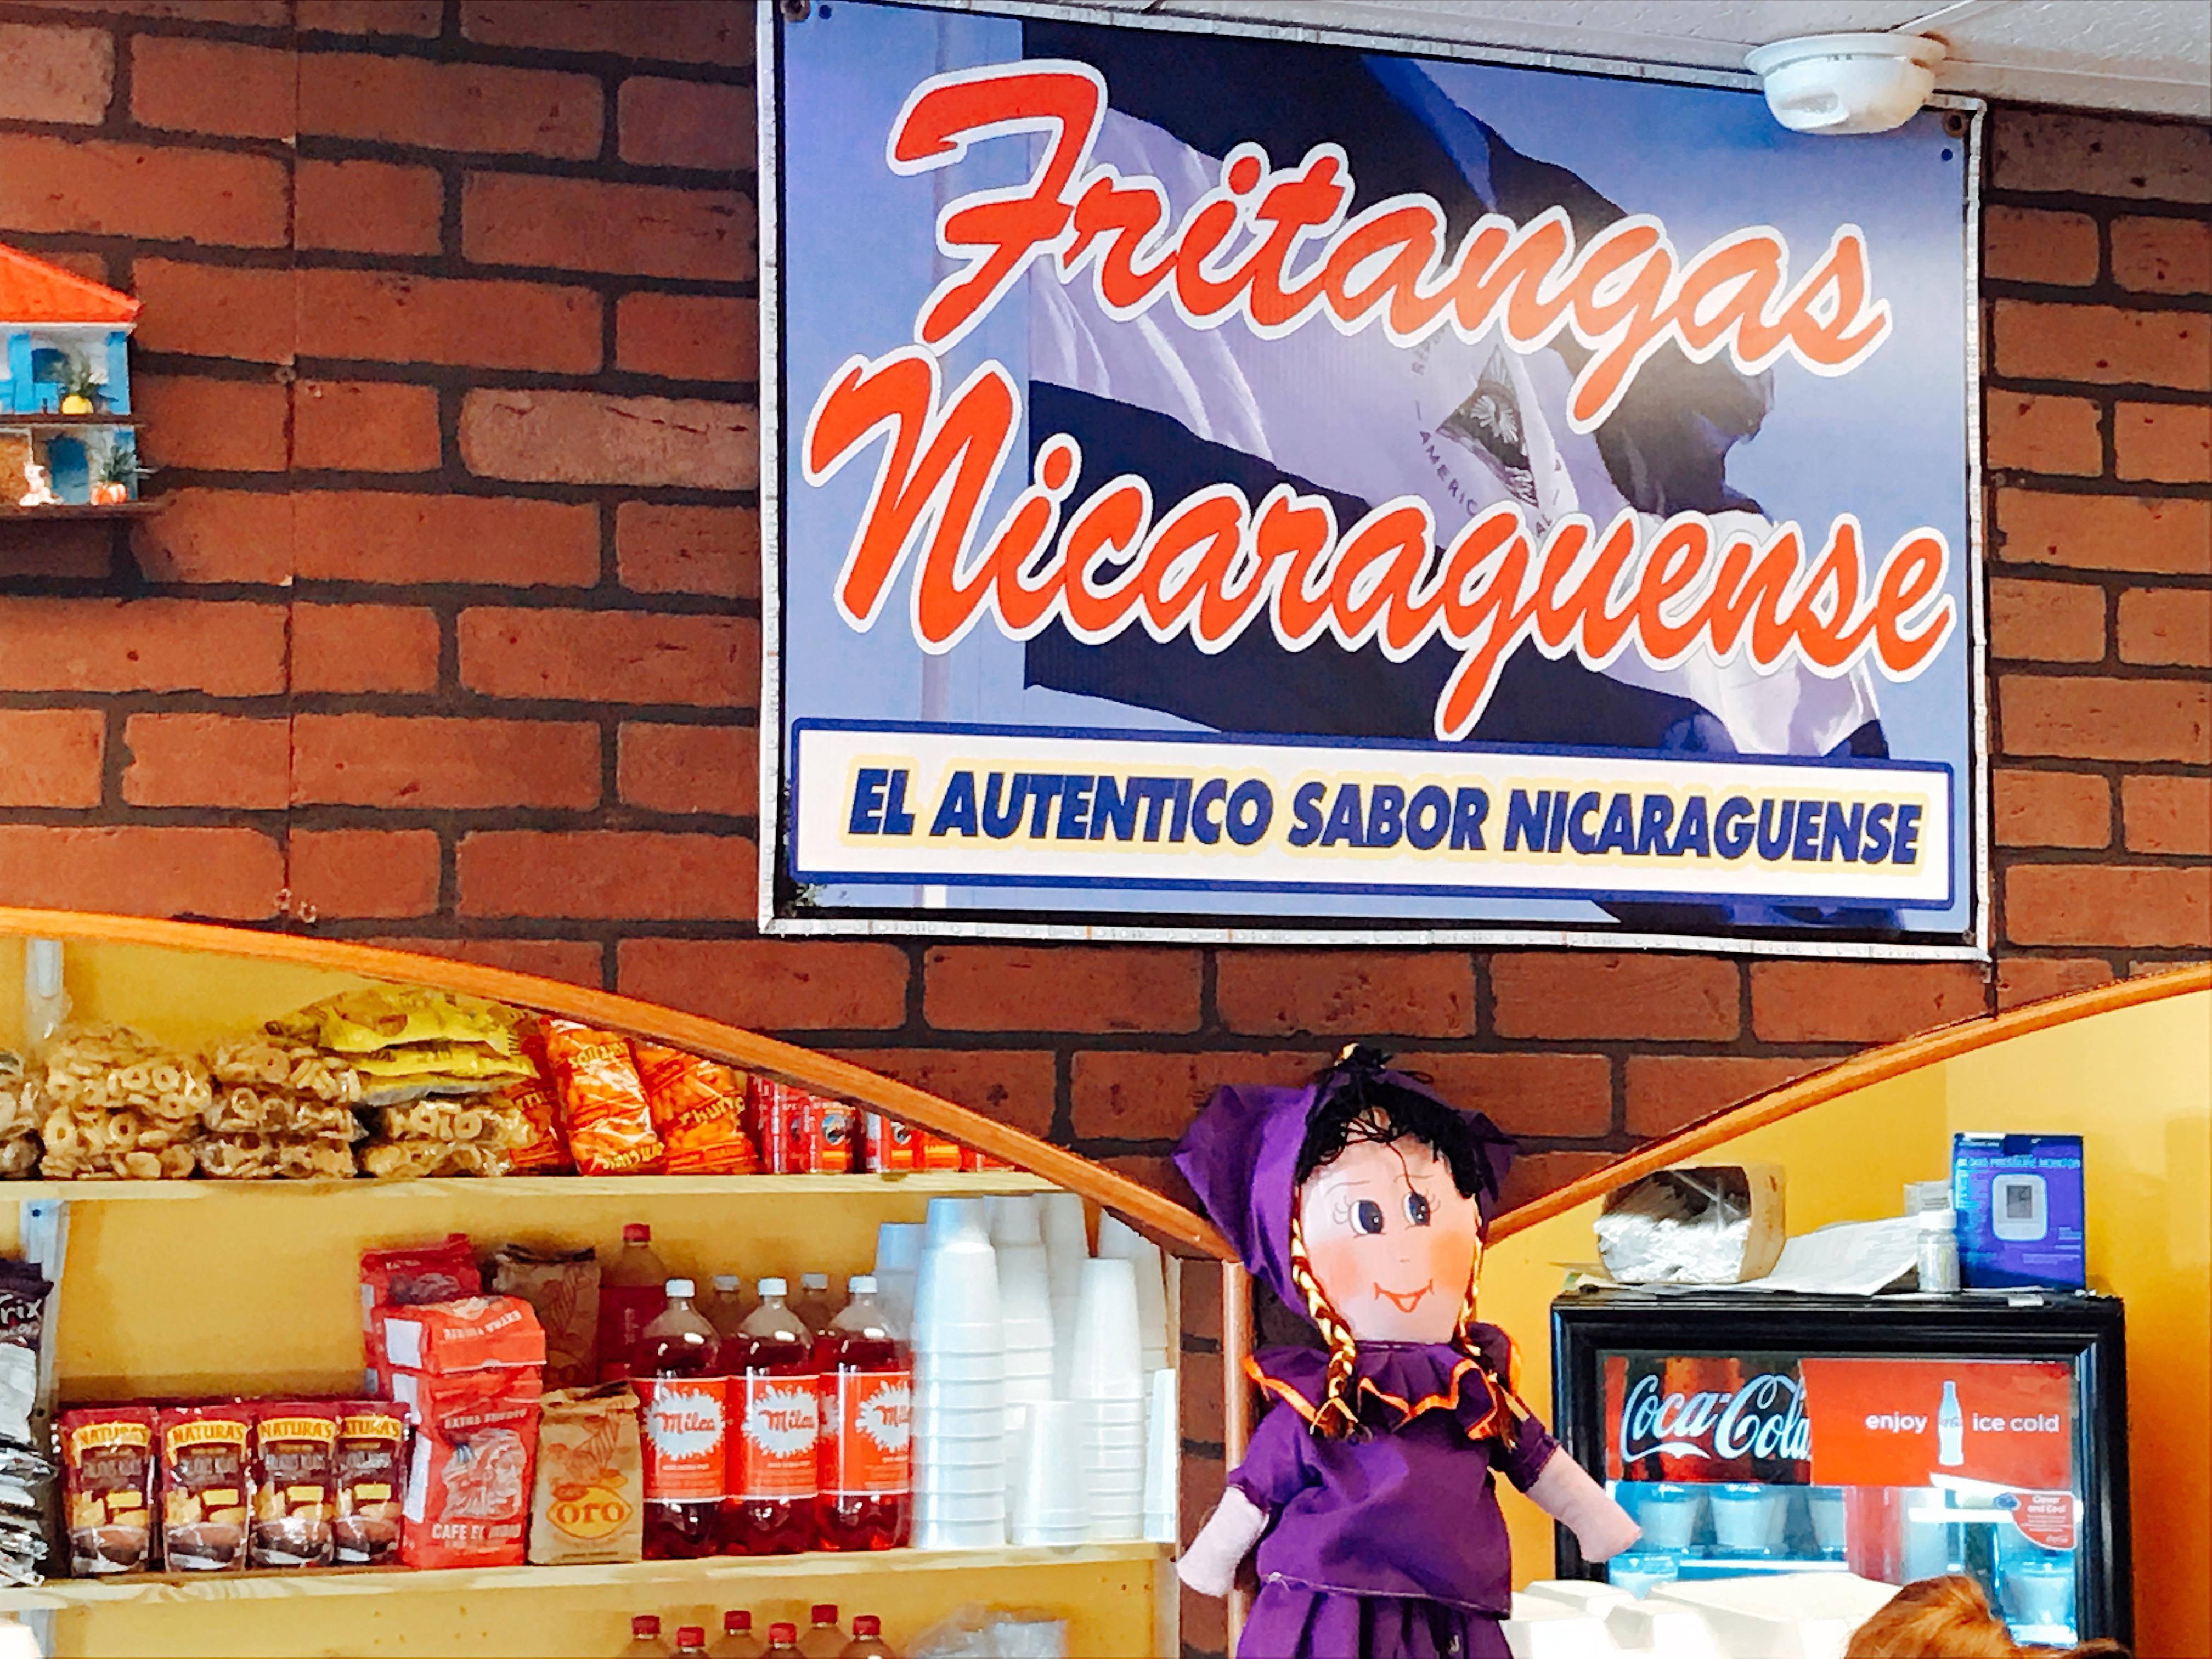 Fritangas Nicaraguense